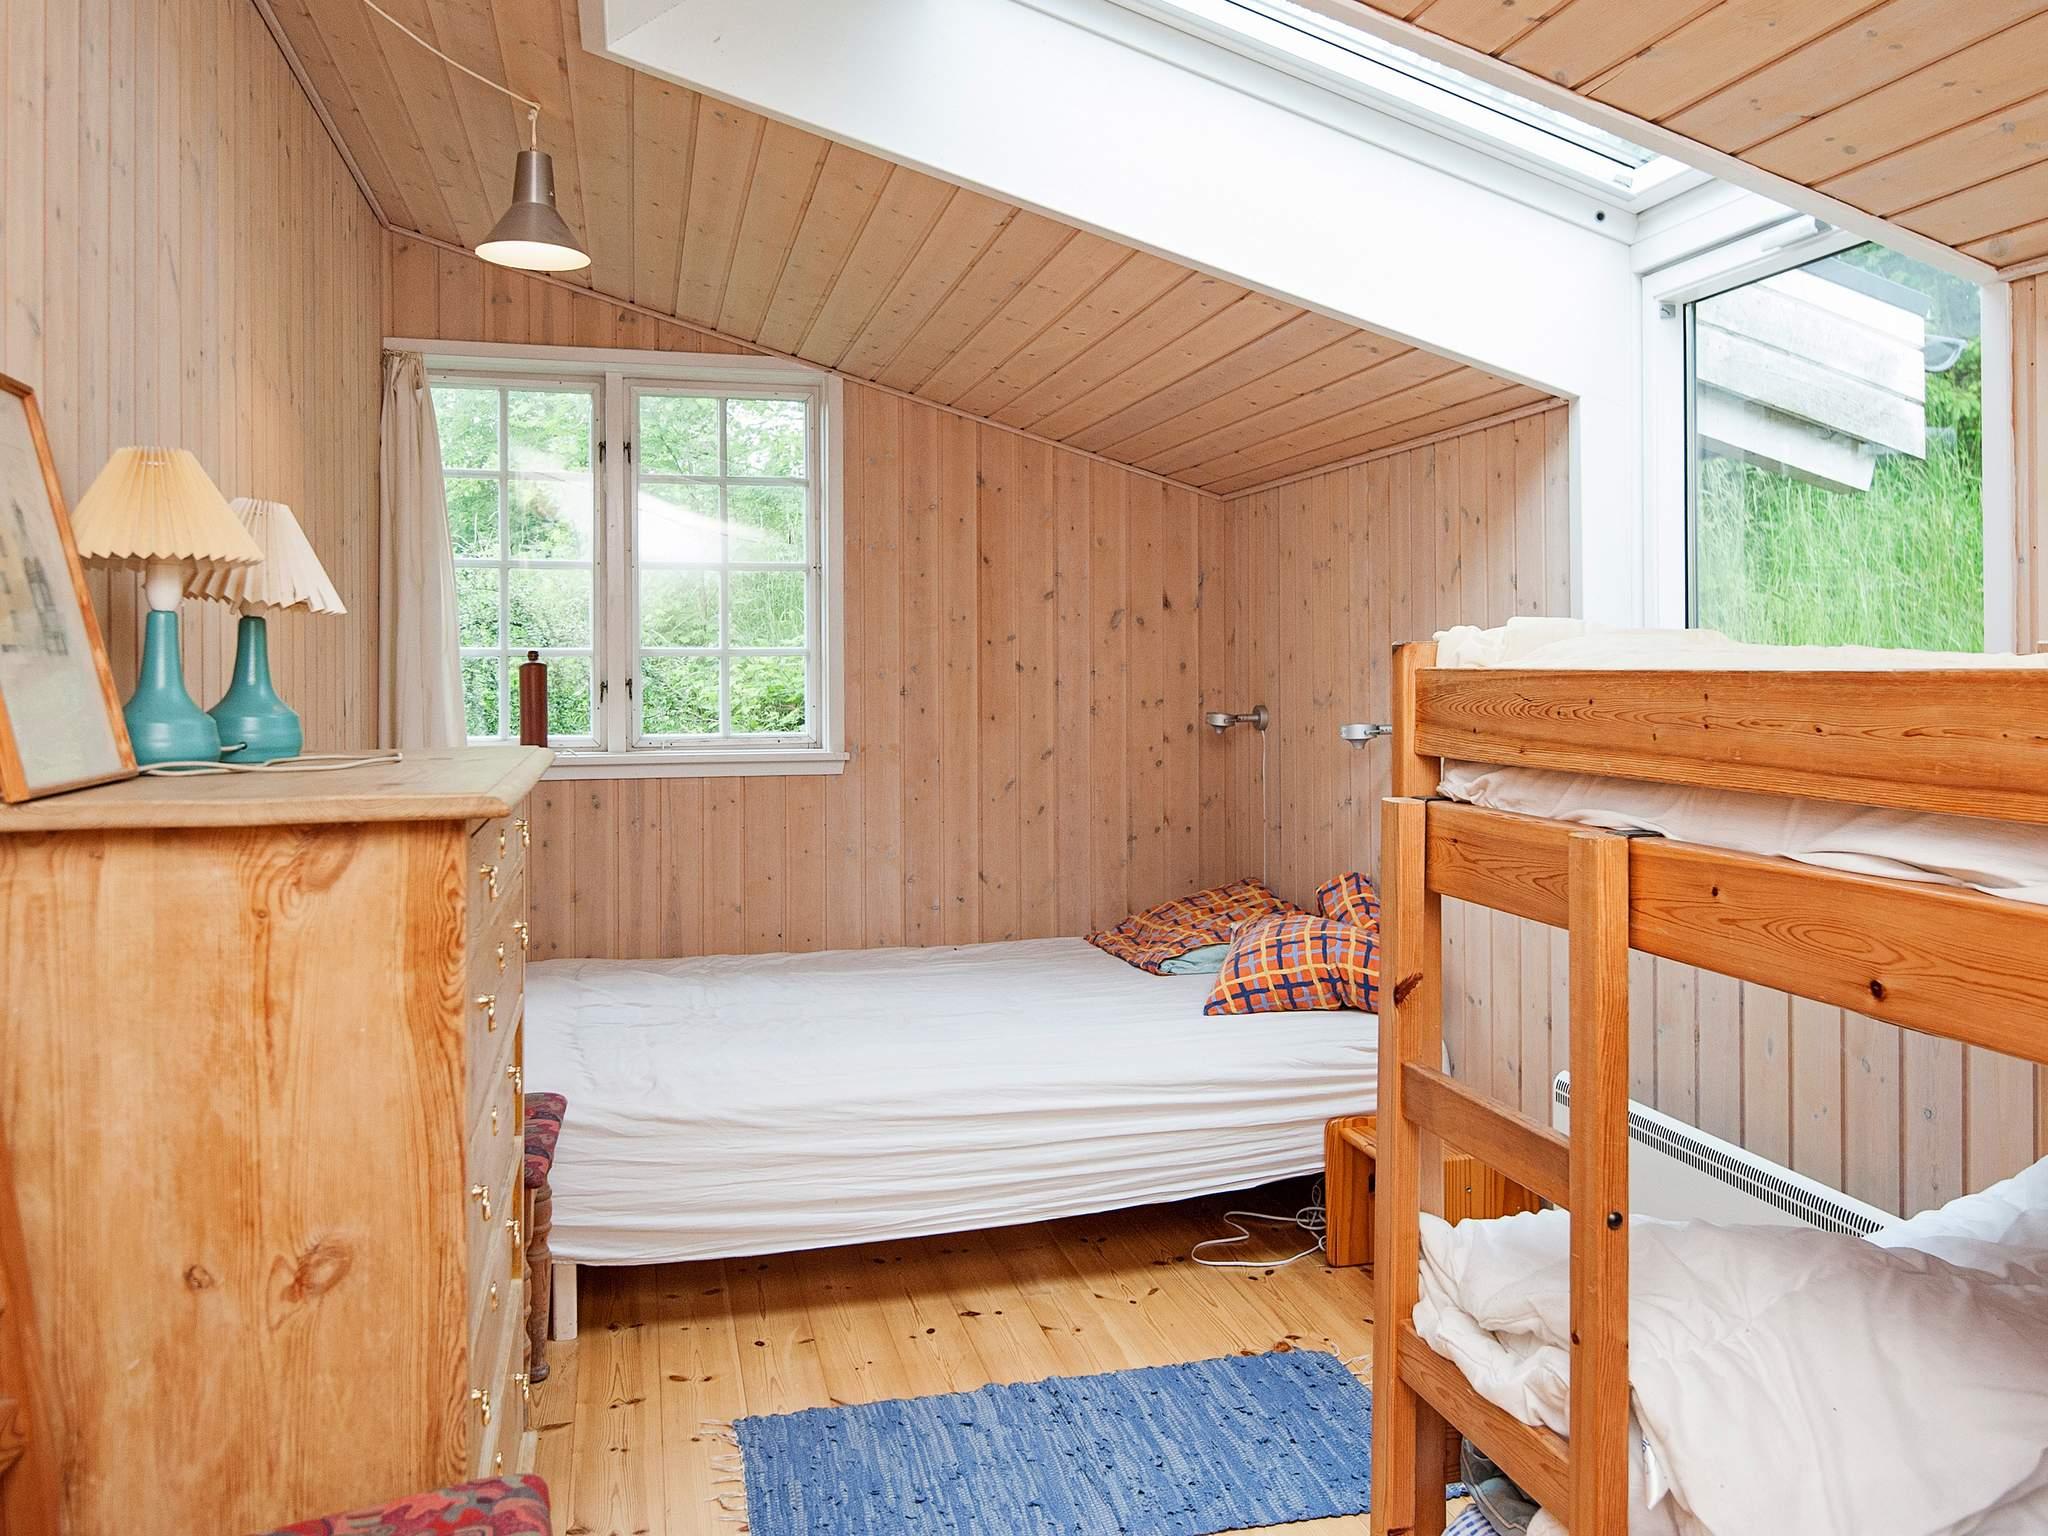 Maison de vacances Helgenæs (2354348), Knebel, , Mer Baltique danoise, Danemark, image 9